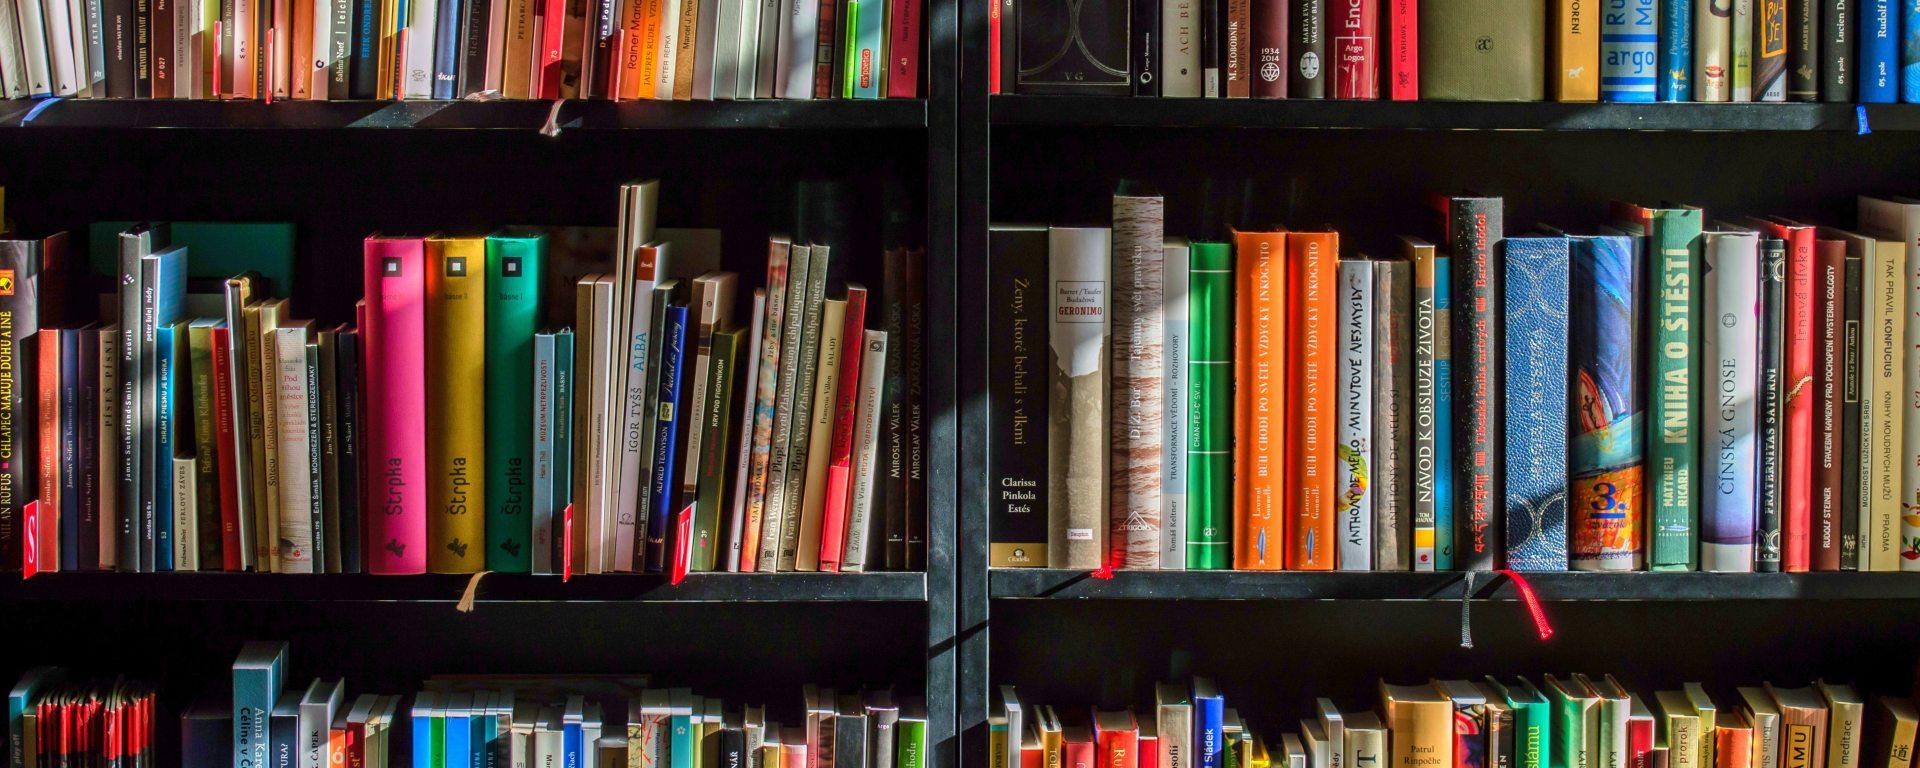 library shelves full of colorful books